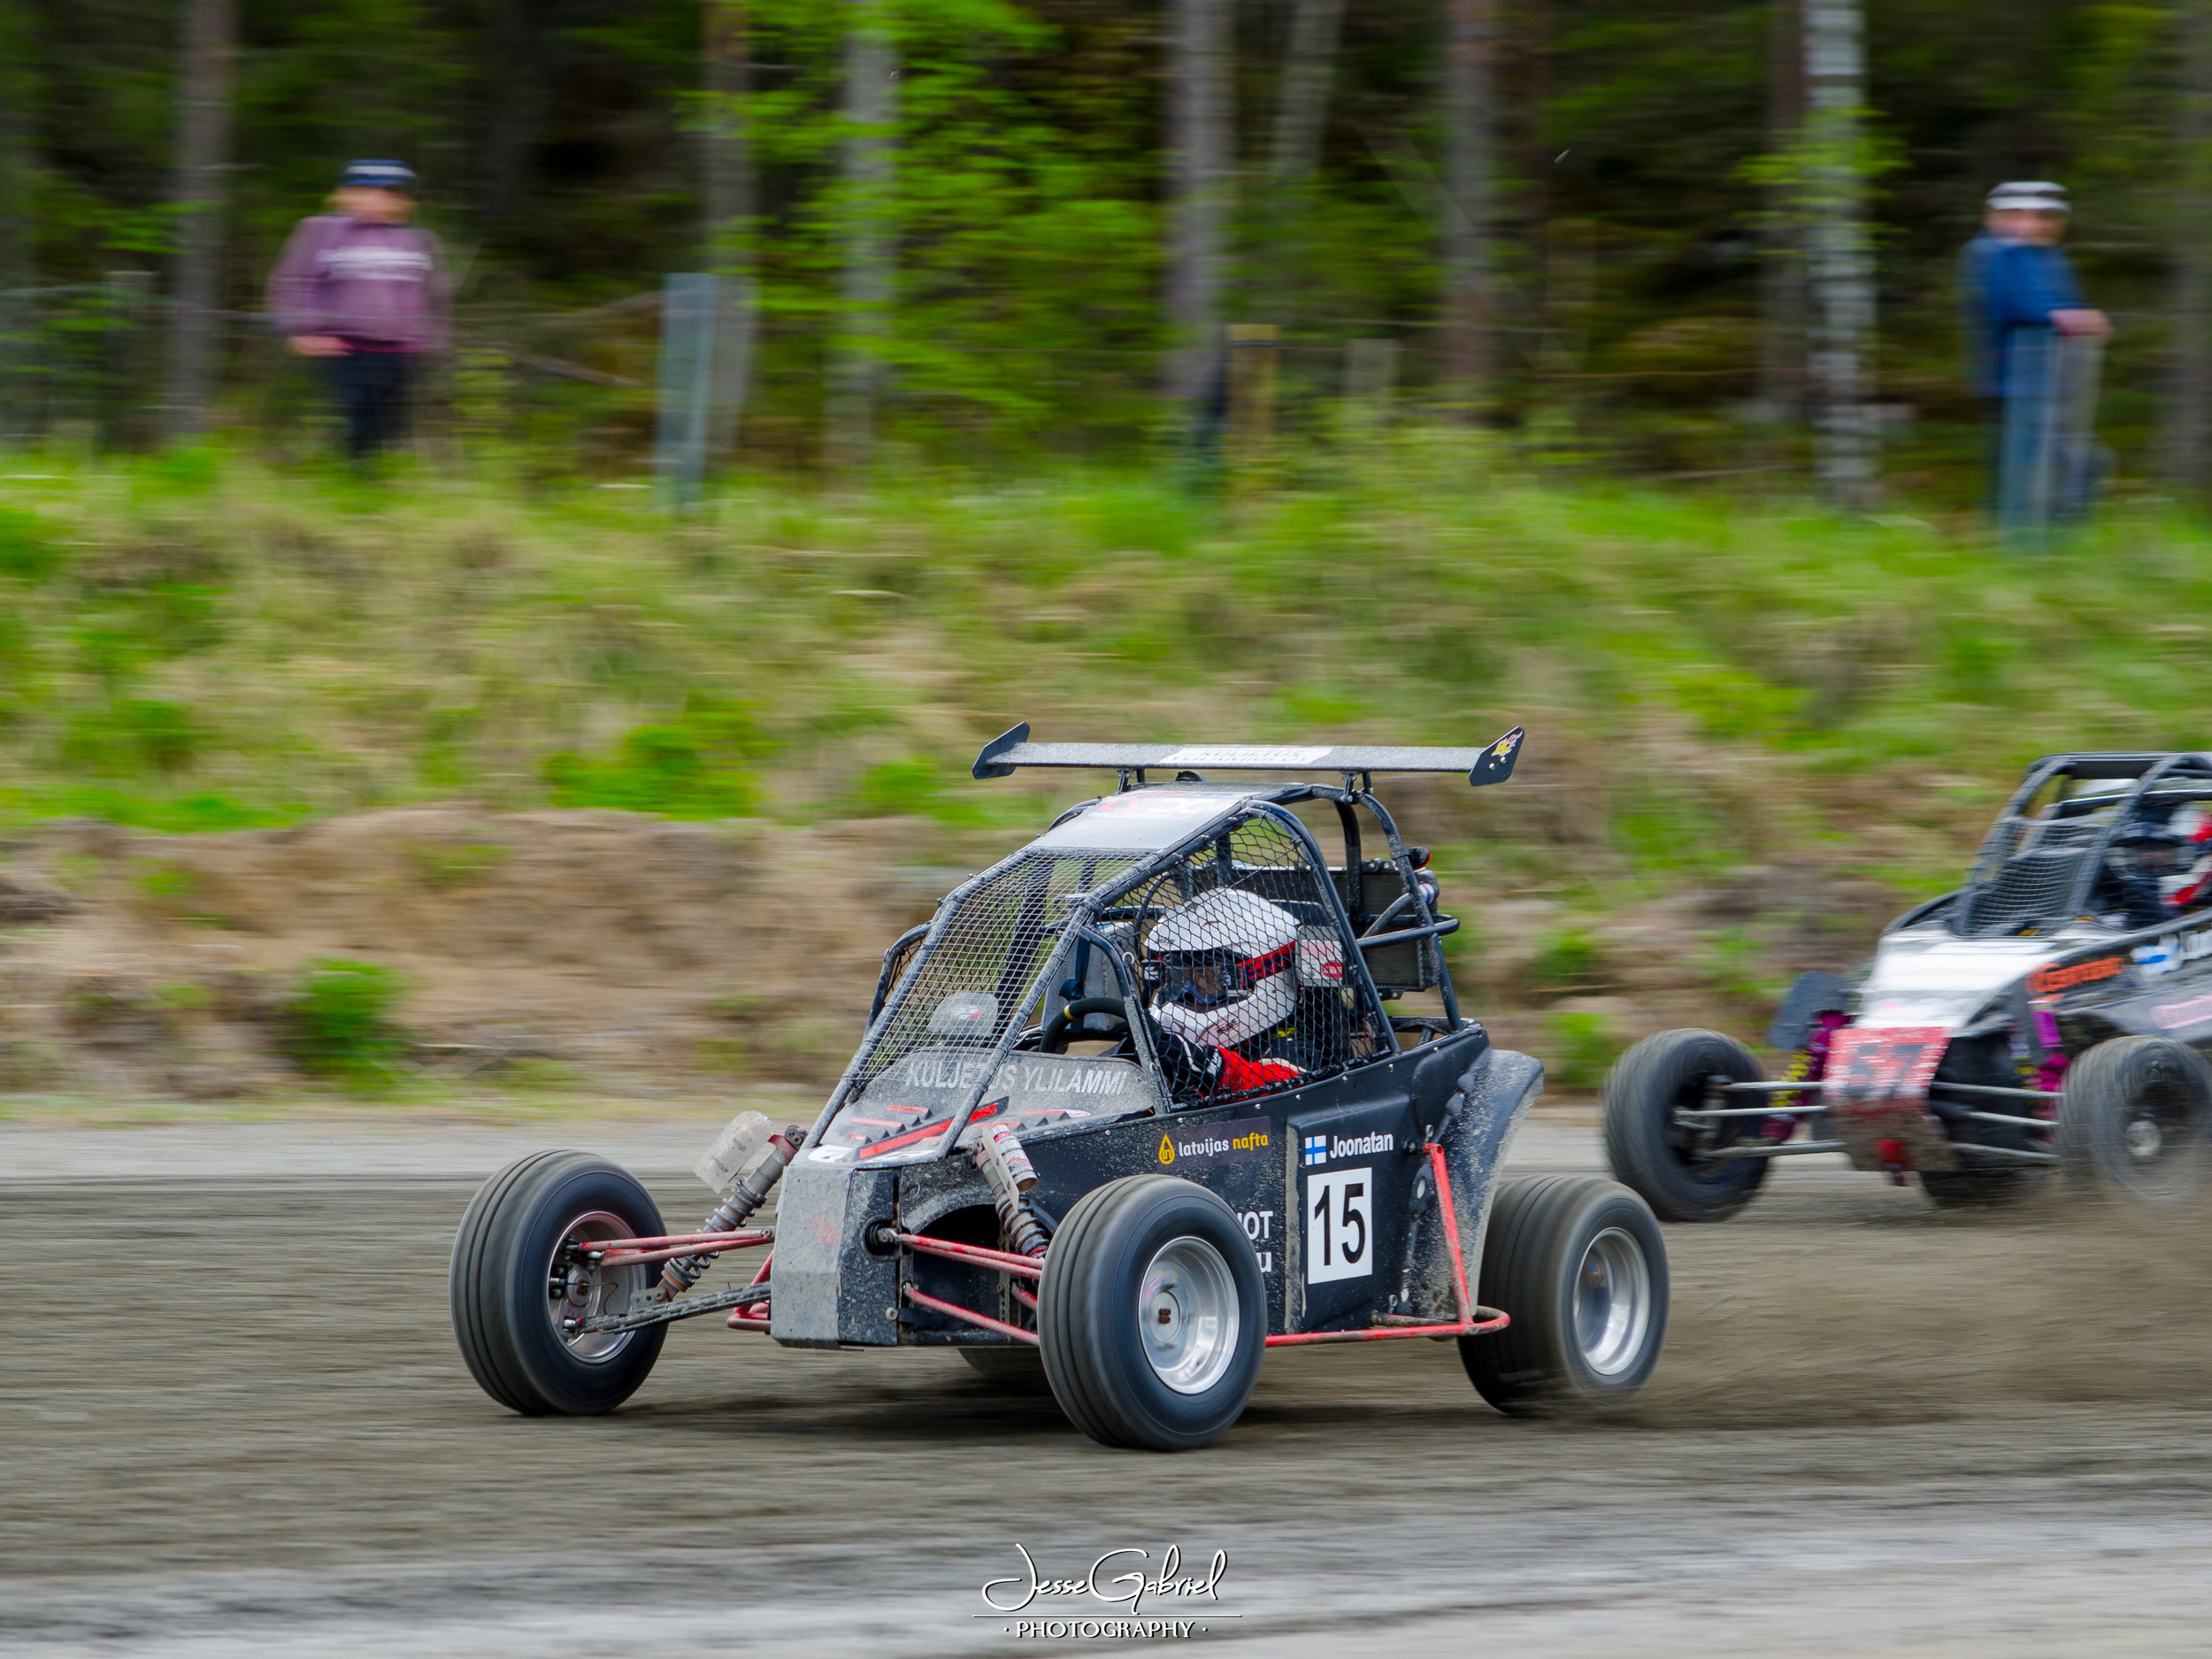 #15 Joonatan Ylilammi - Seura: KarUA/MKAuto: Mtec / Yamaha